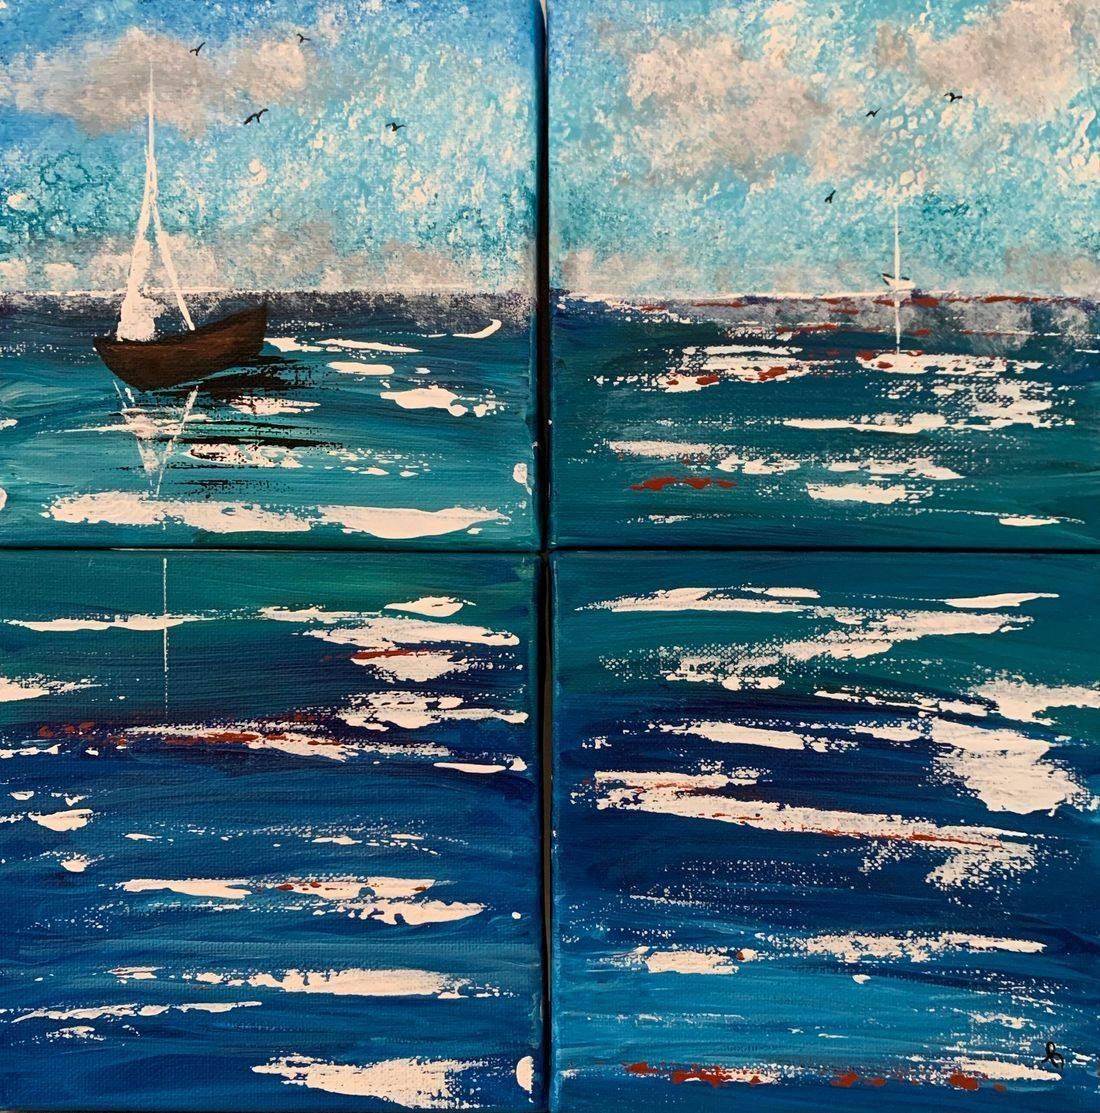 One Direction , sailboats, seagulls, Pacific Ocean, Oregon Coast, beach, ocean, cloudy skies, Oregon Artist, Abstract Artist, Local Artist, Hope Angel Fine Art